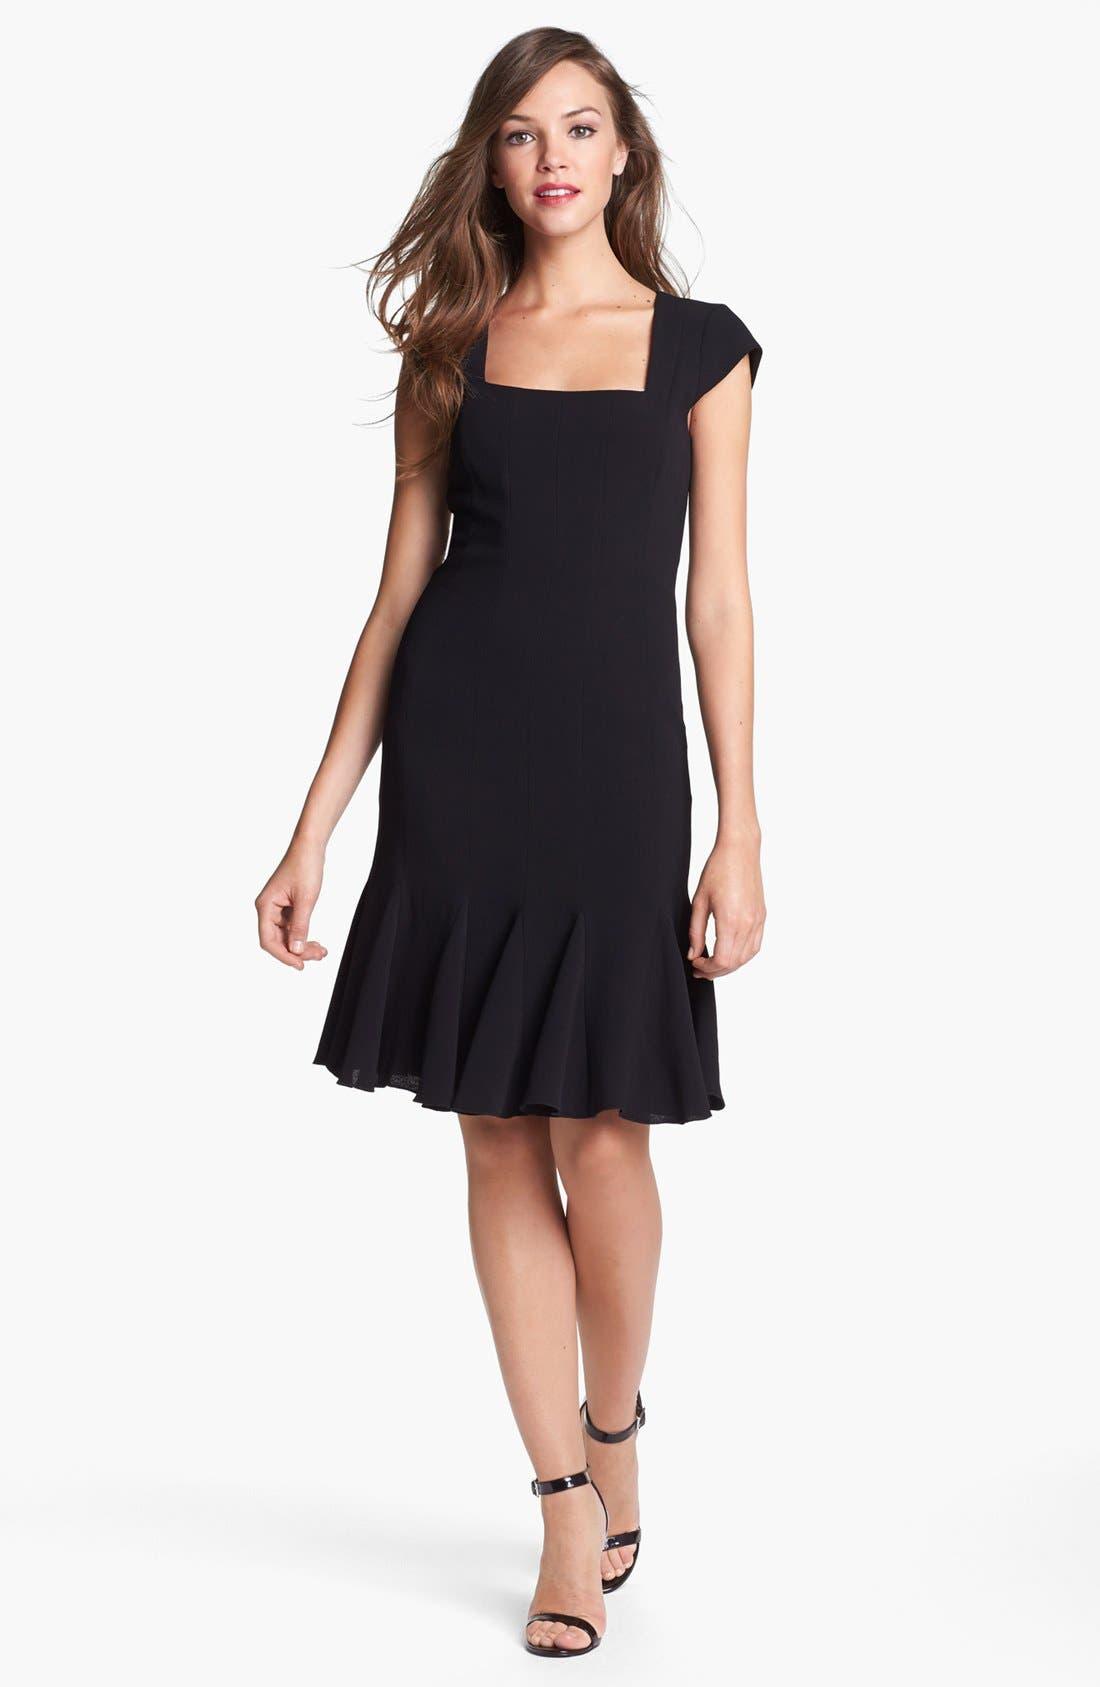 Alternate Image 1 Selected - BCBGMAXAZRIA Cap Sleeve Fit & Flare Dress